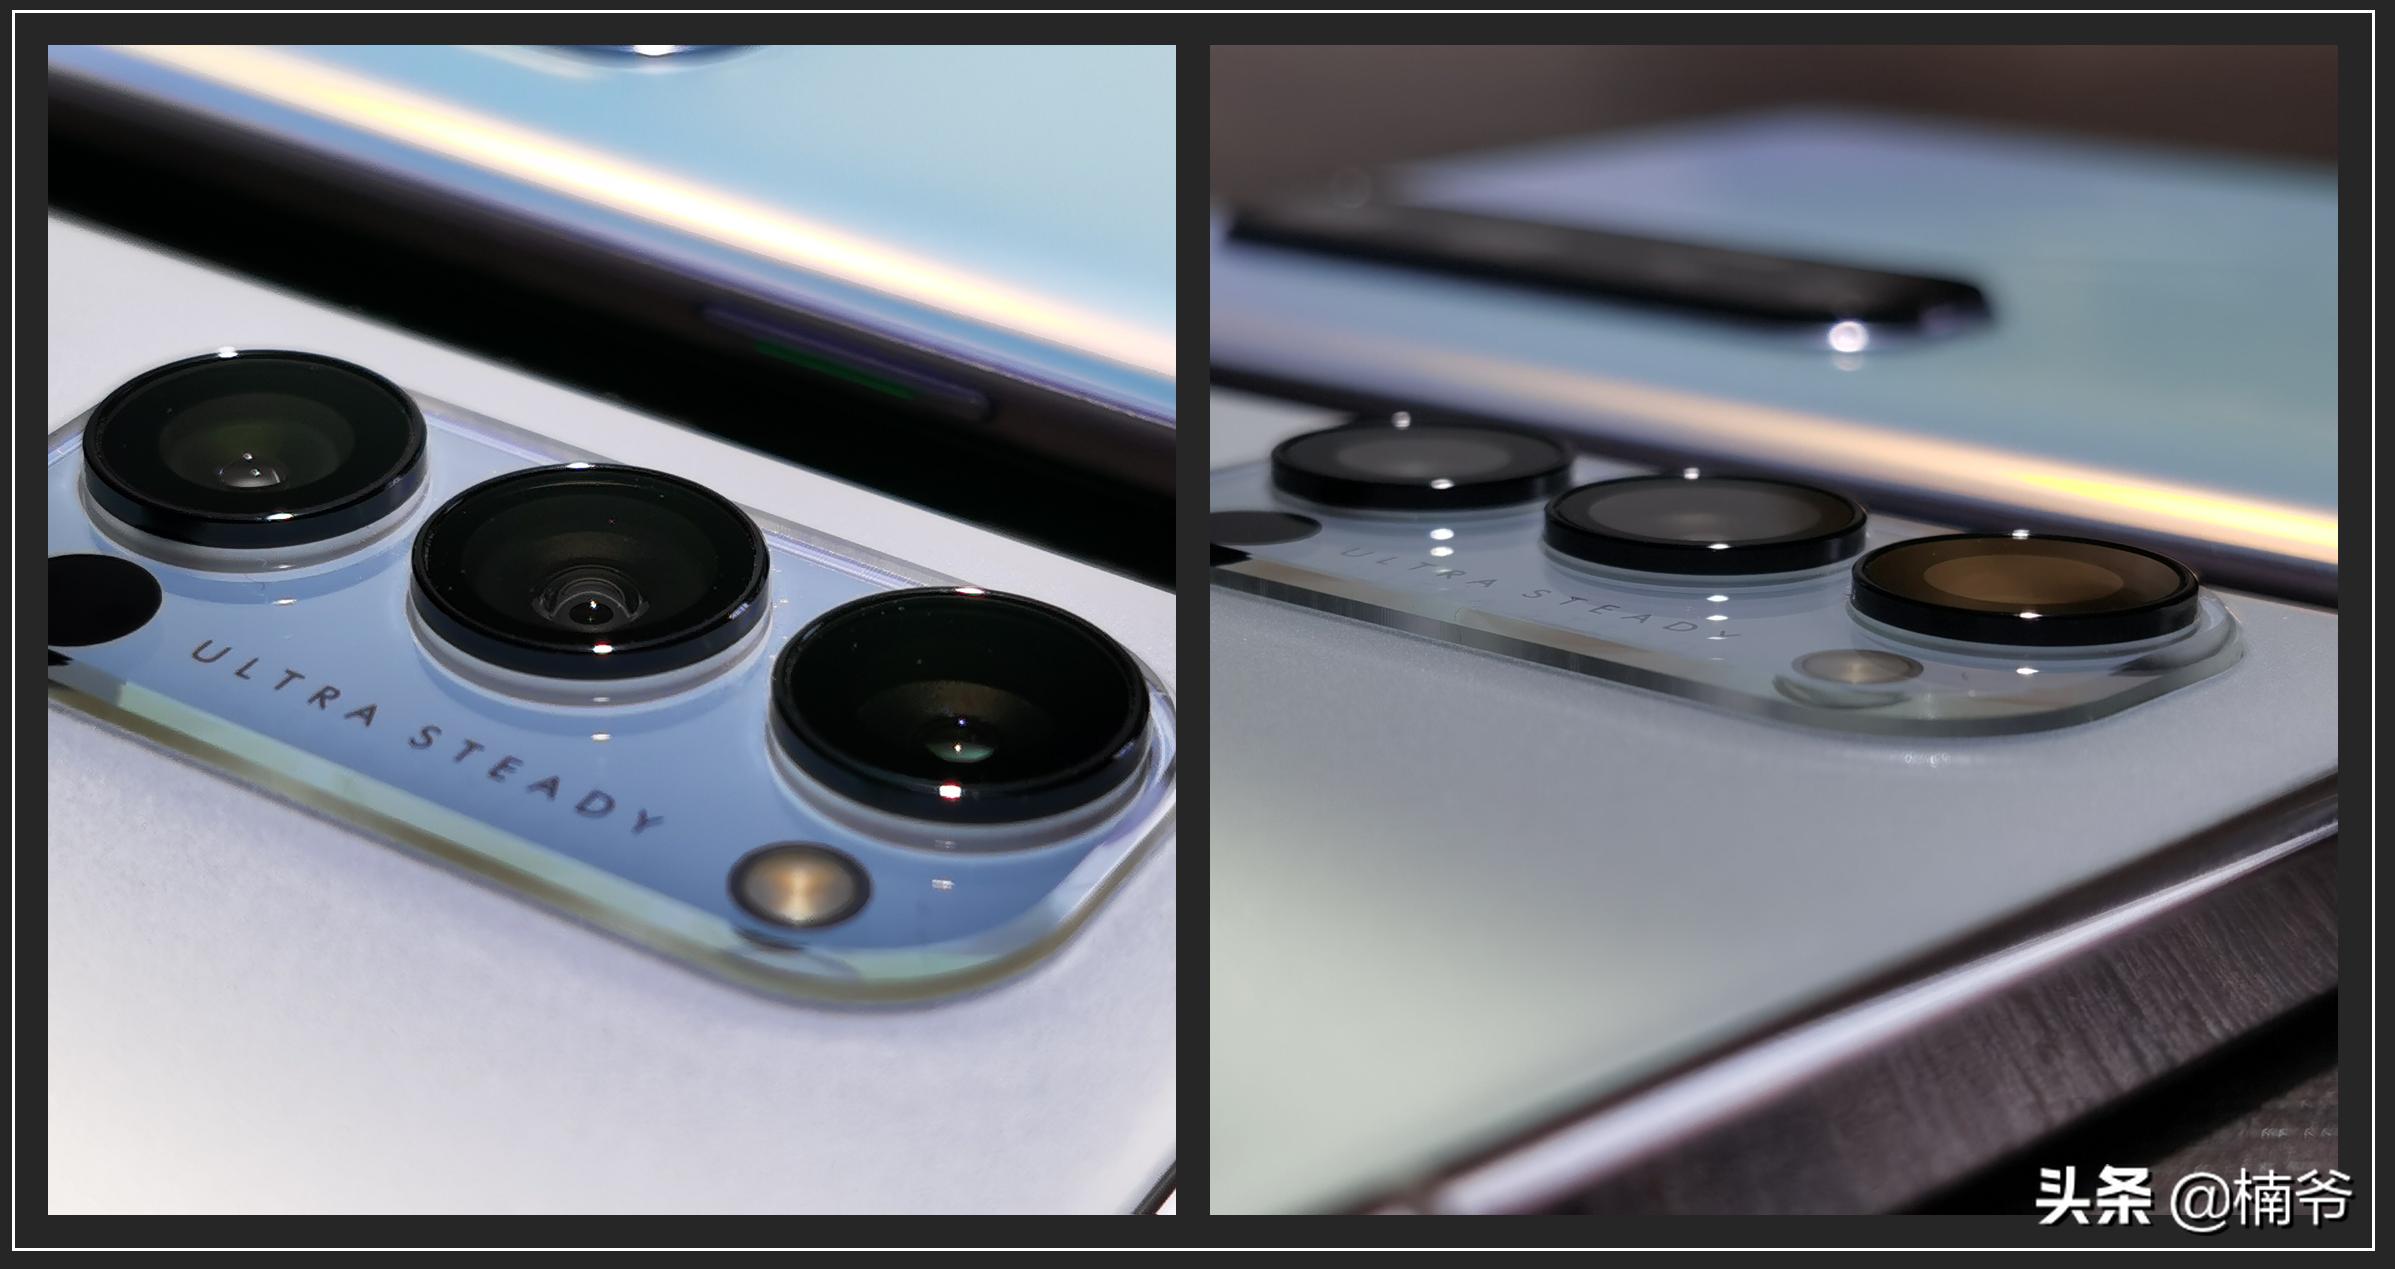 OPPO Reno4 Pro首发评测:视频超强防抖还有65W闪充,重量仅172g